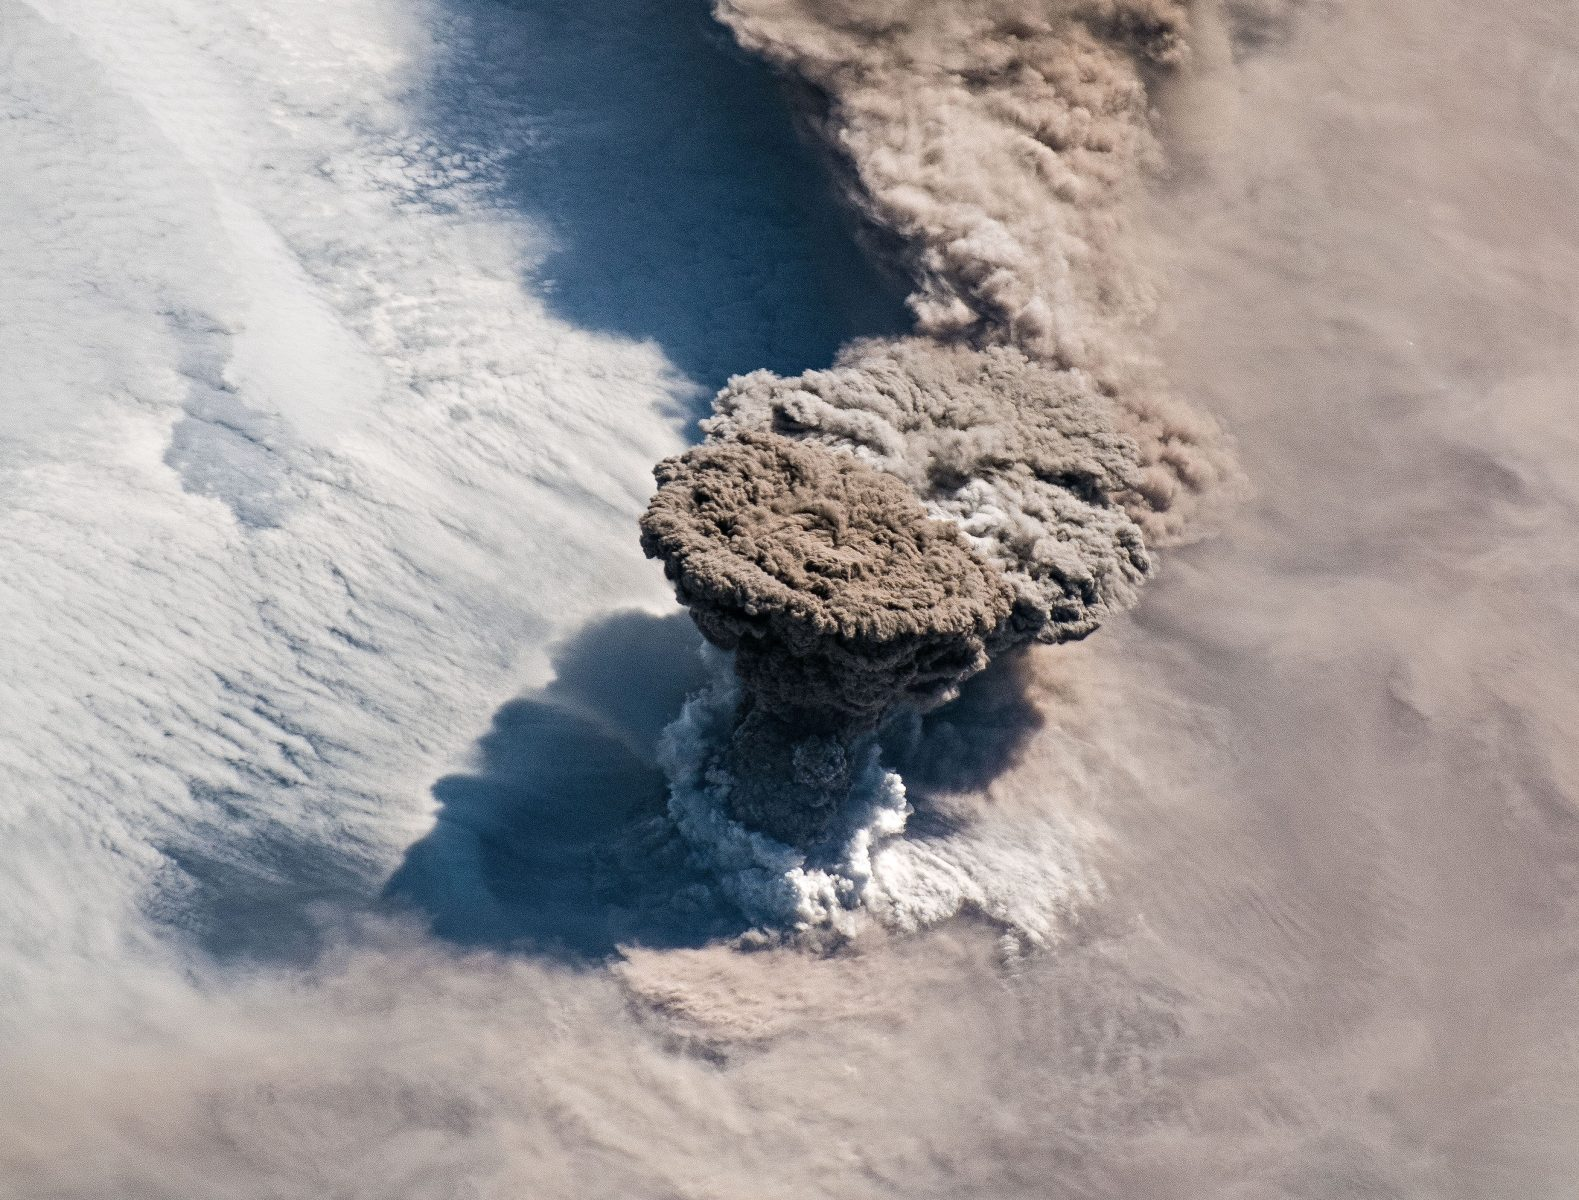 vulcano Raikoke eruzione spazio nasa